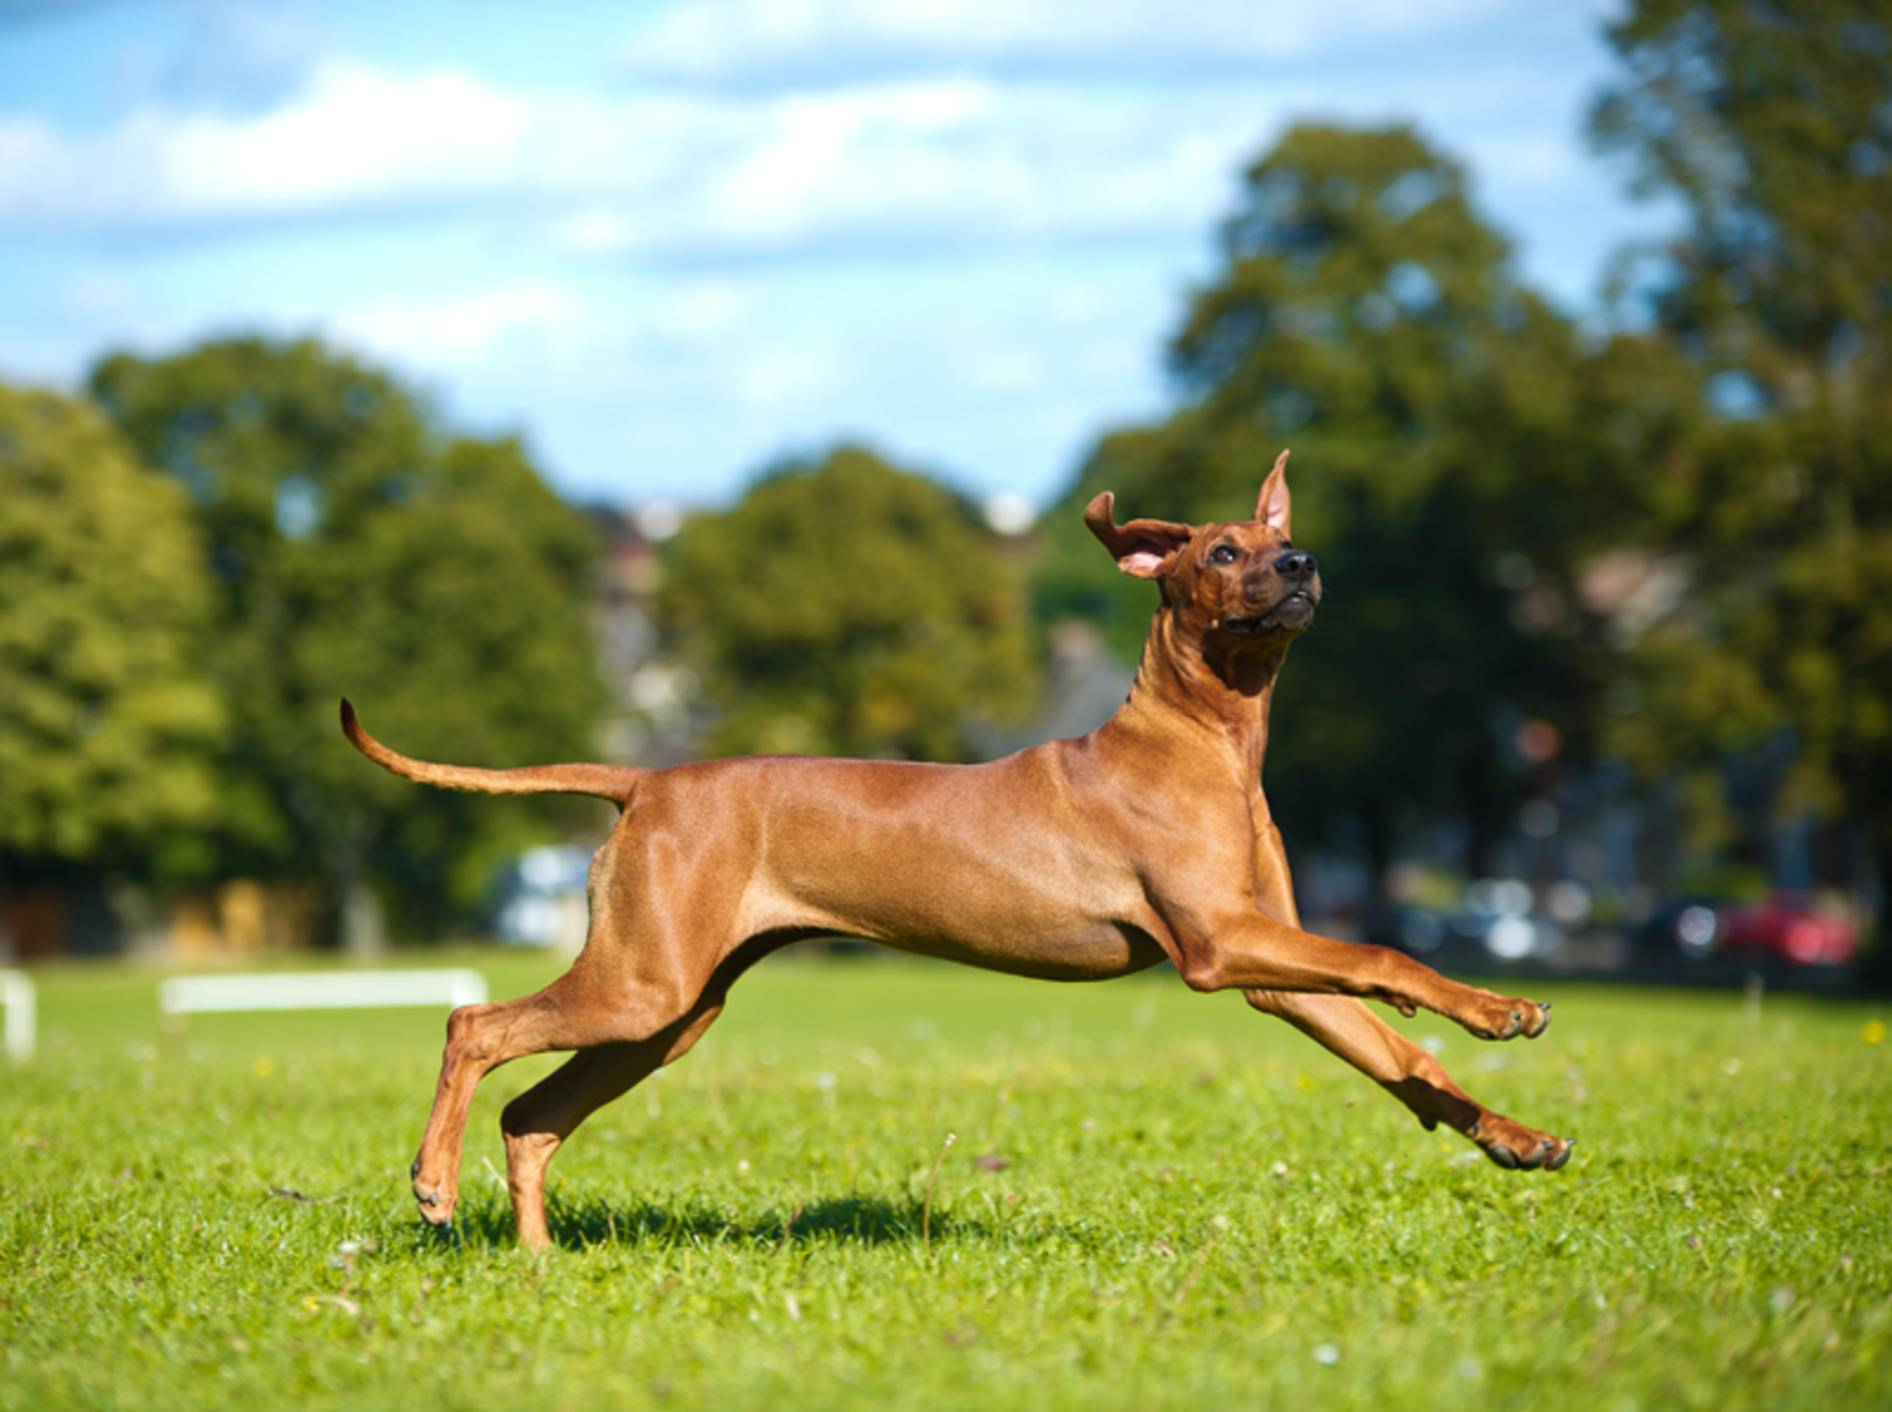 Beim Hundesport kann sich der Rhodesian Ridgeback so richtig austoben – Shutterstock / Tatiana-Katsai